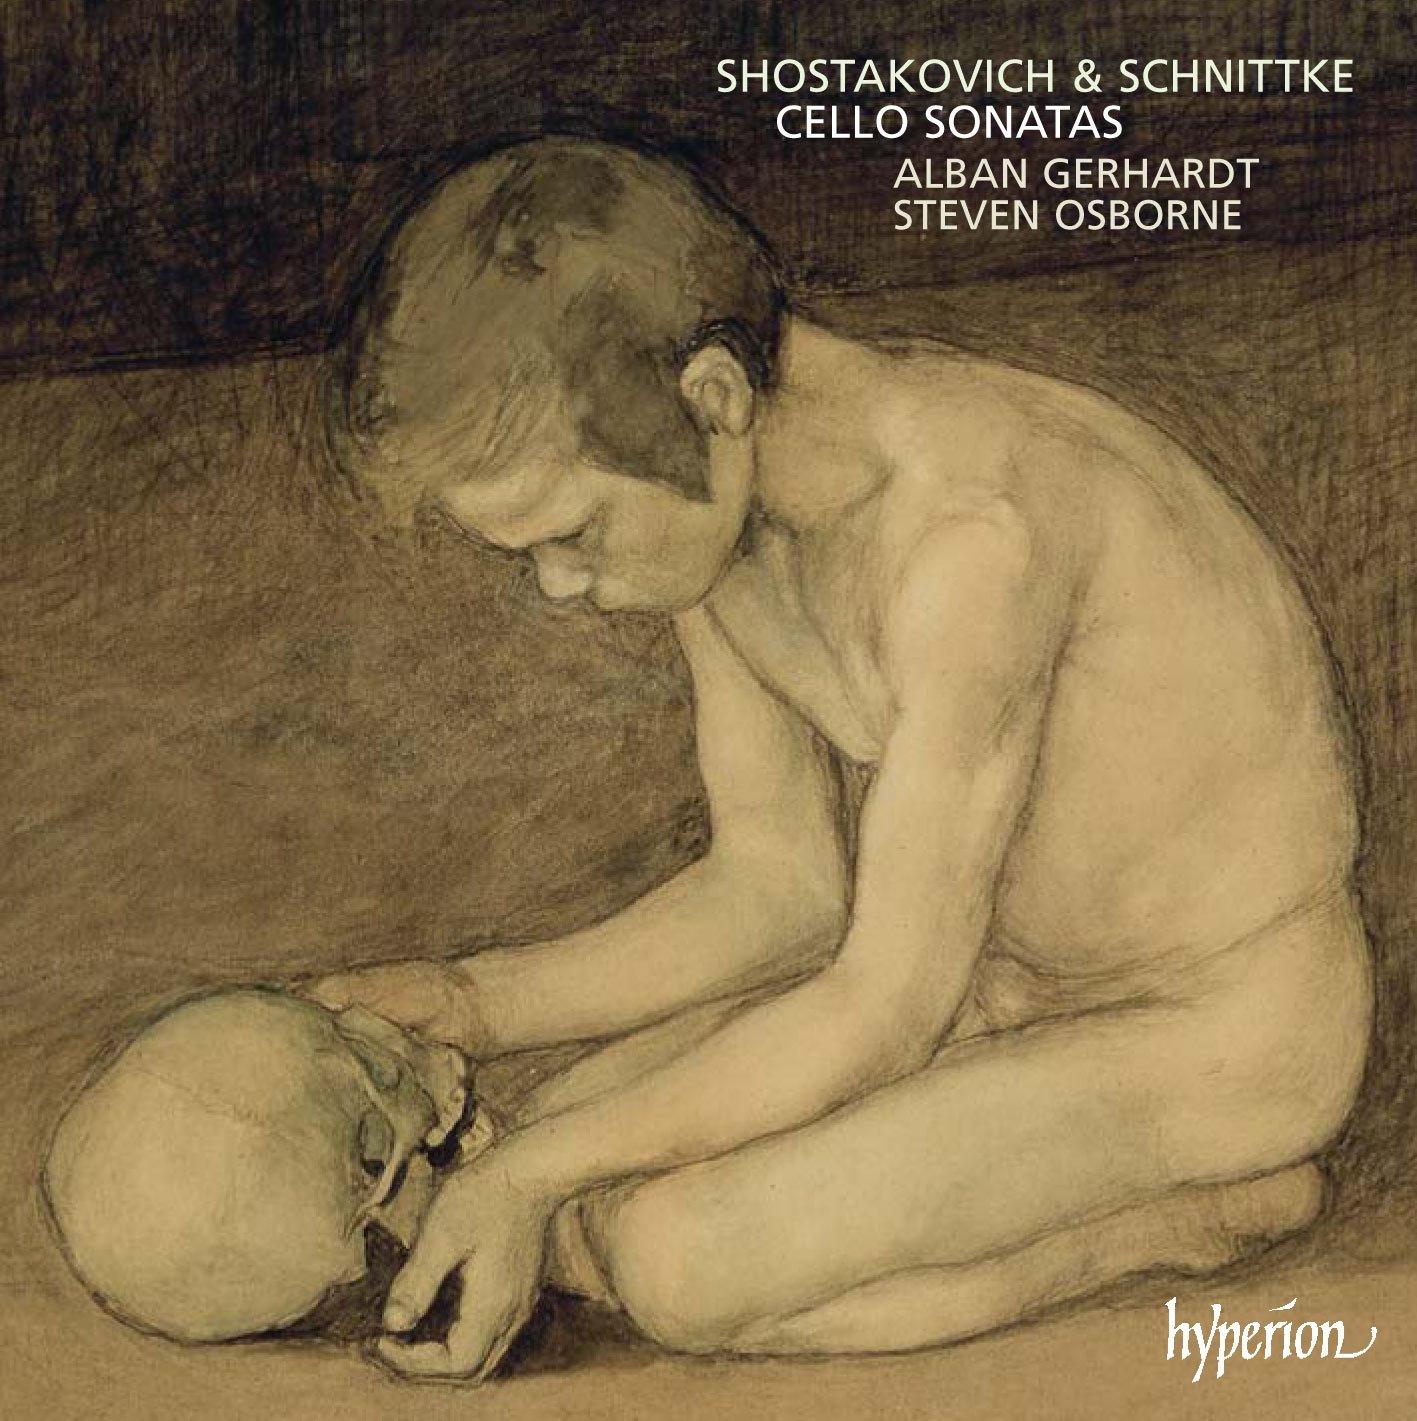 Shostakovich: Cello Sonata, Eight Pieces; Schnittke: Cello Sonata